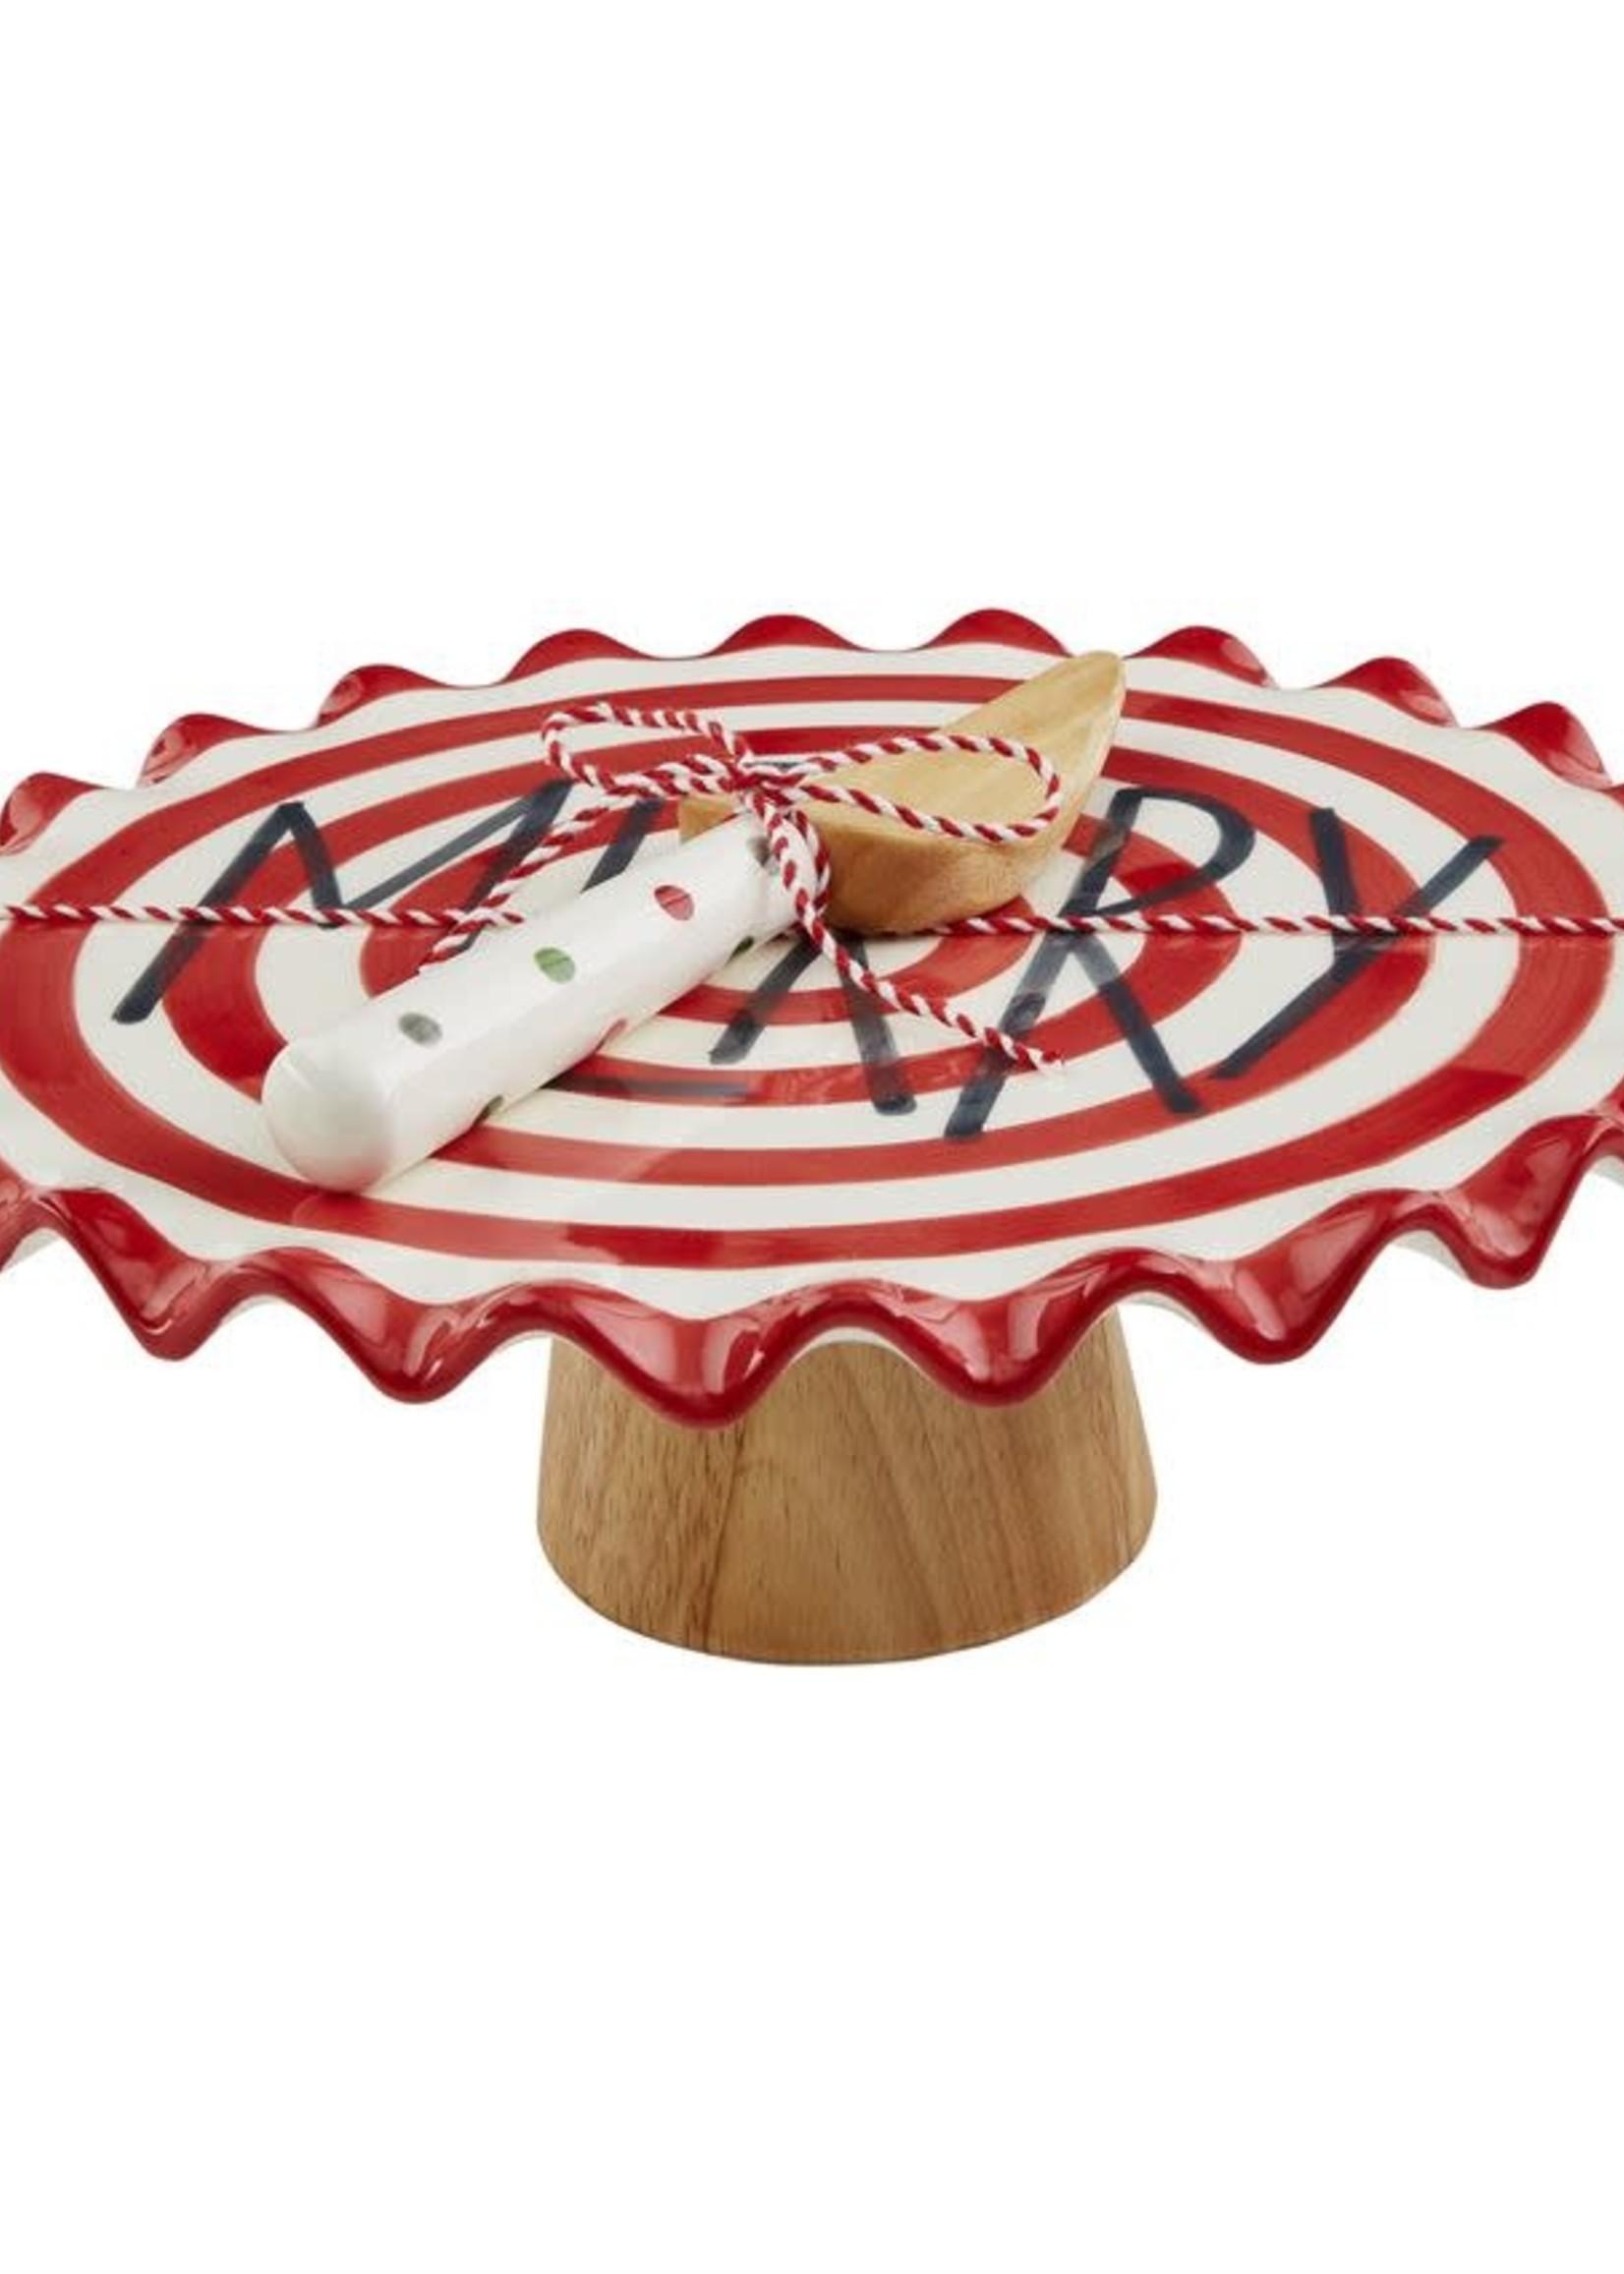 Merry Cake Pedestal Set